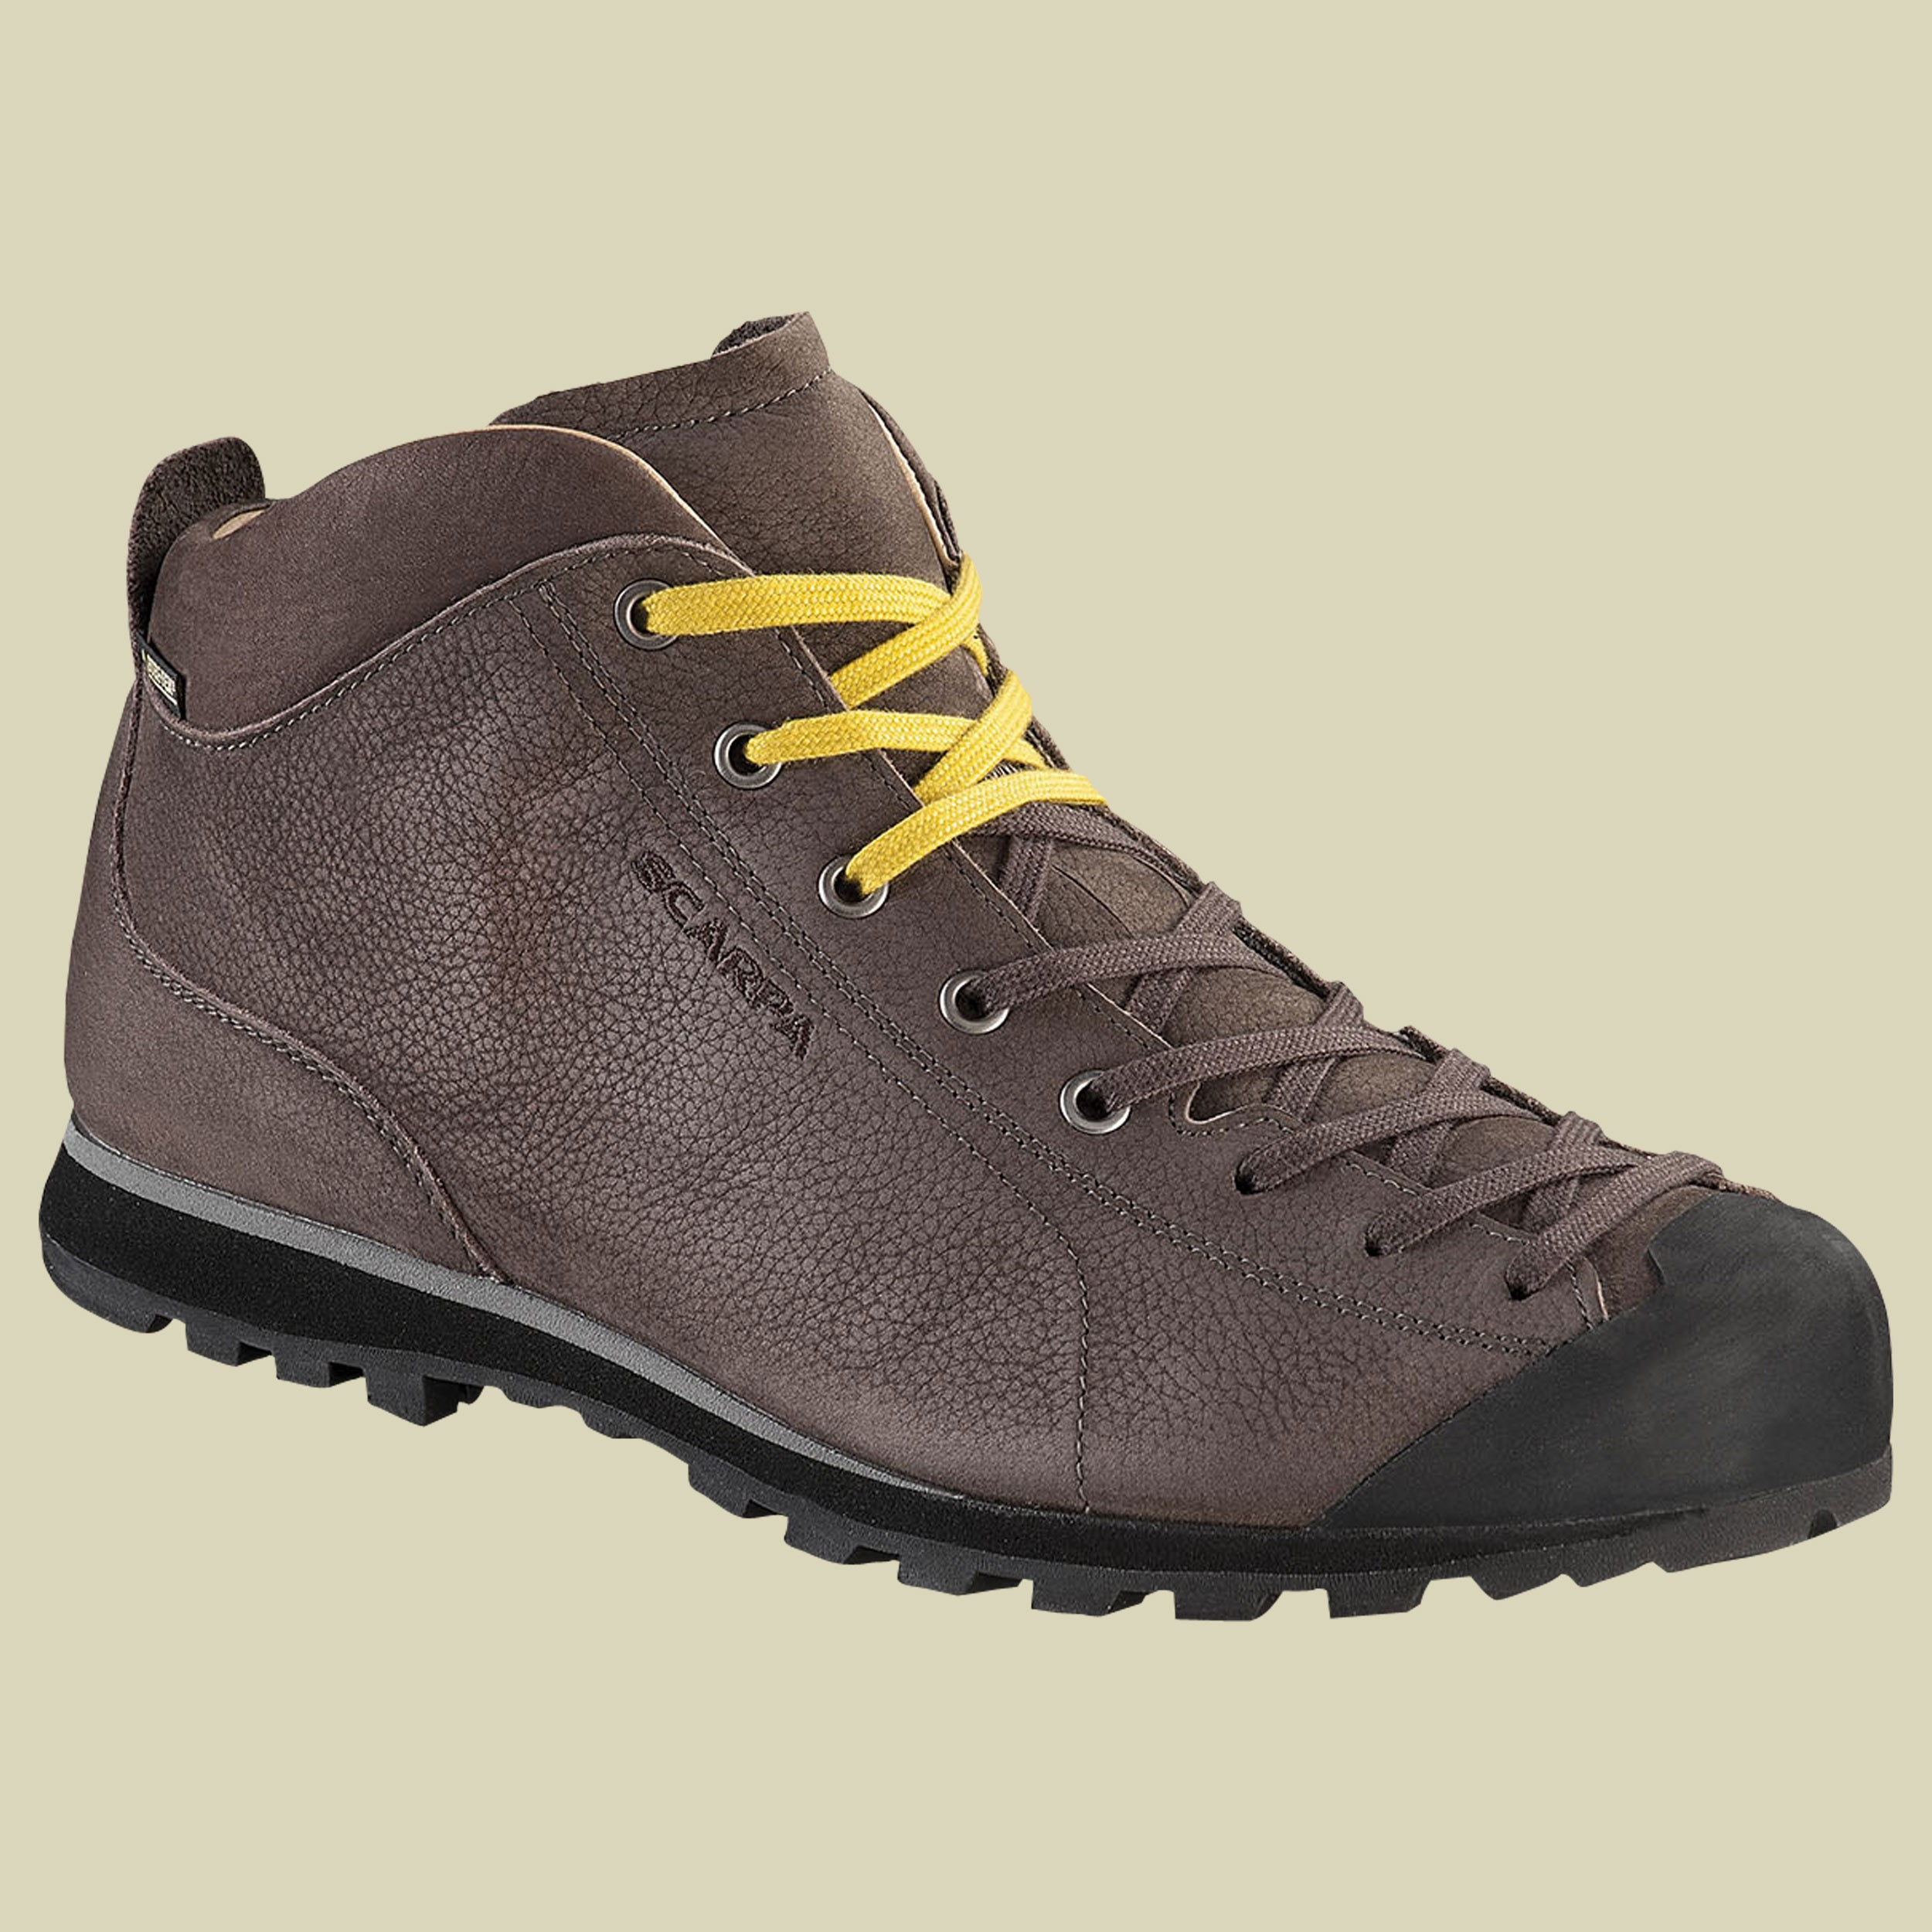 Scarpa Schuhe Mojito Basic Mid GTX Größe 42 brown HZCzS1